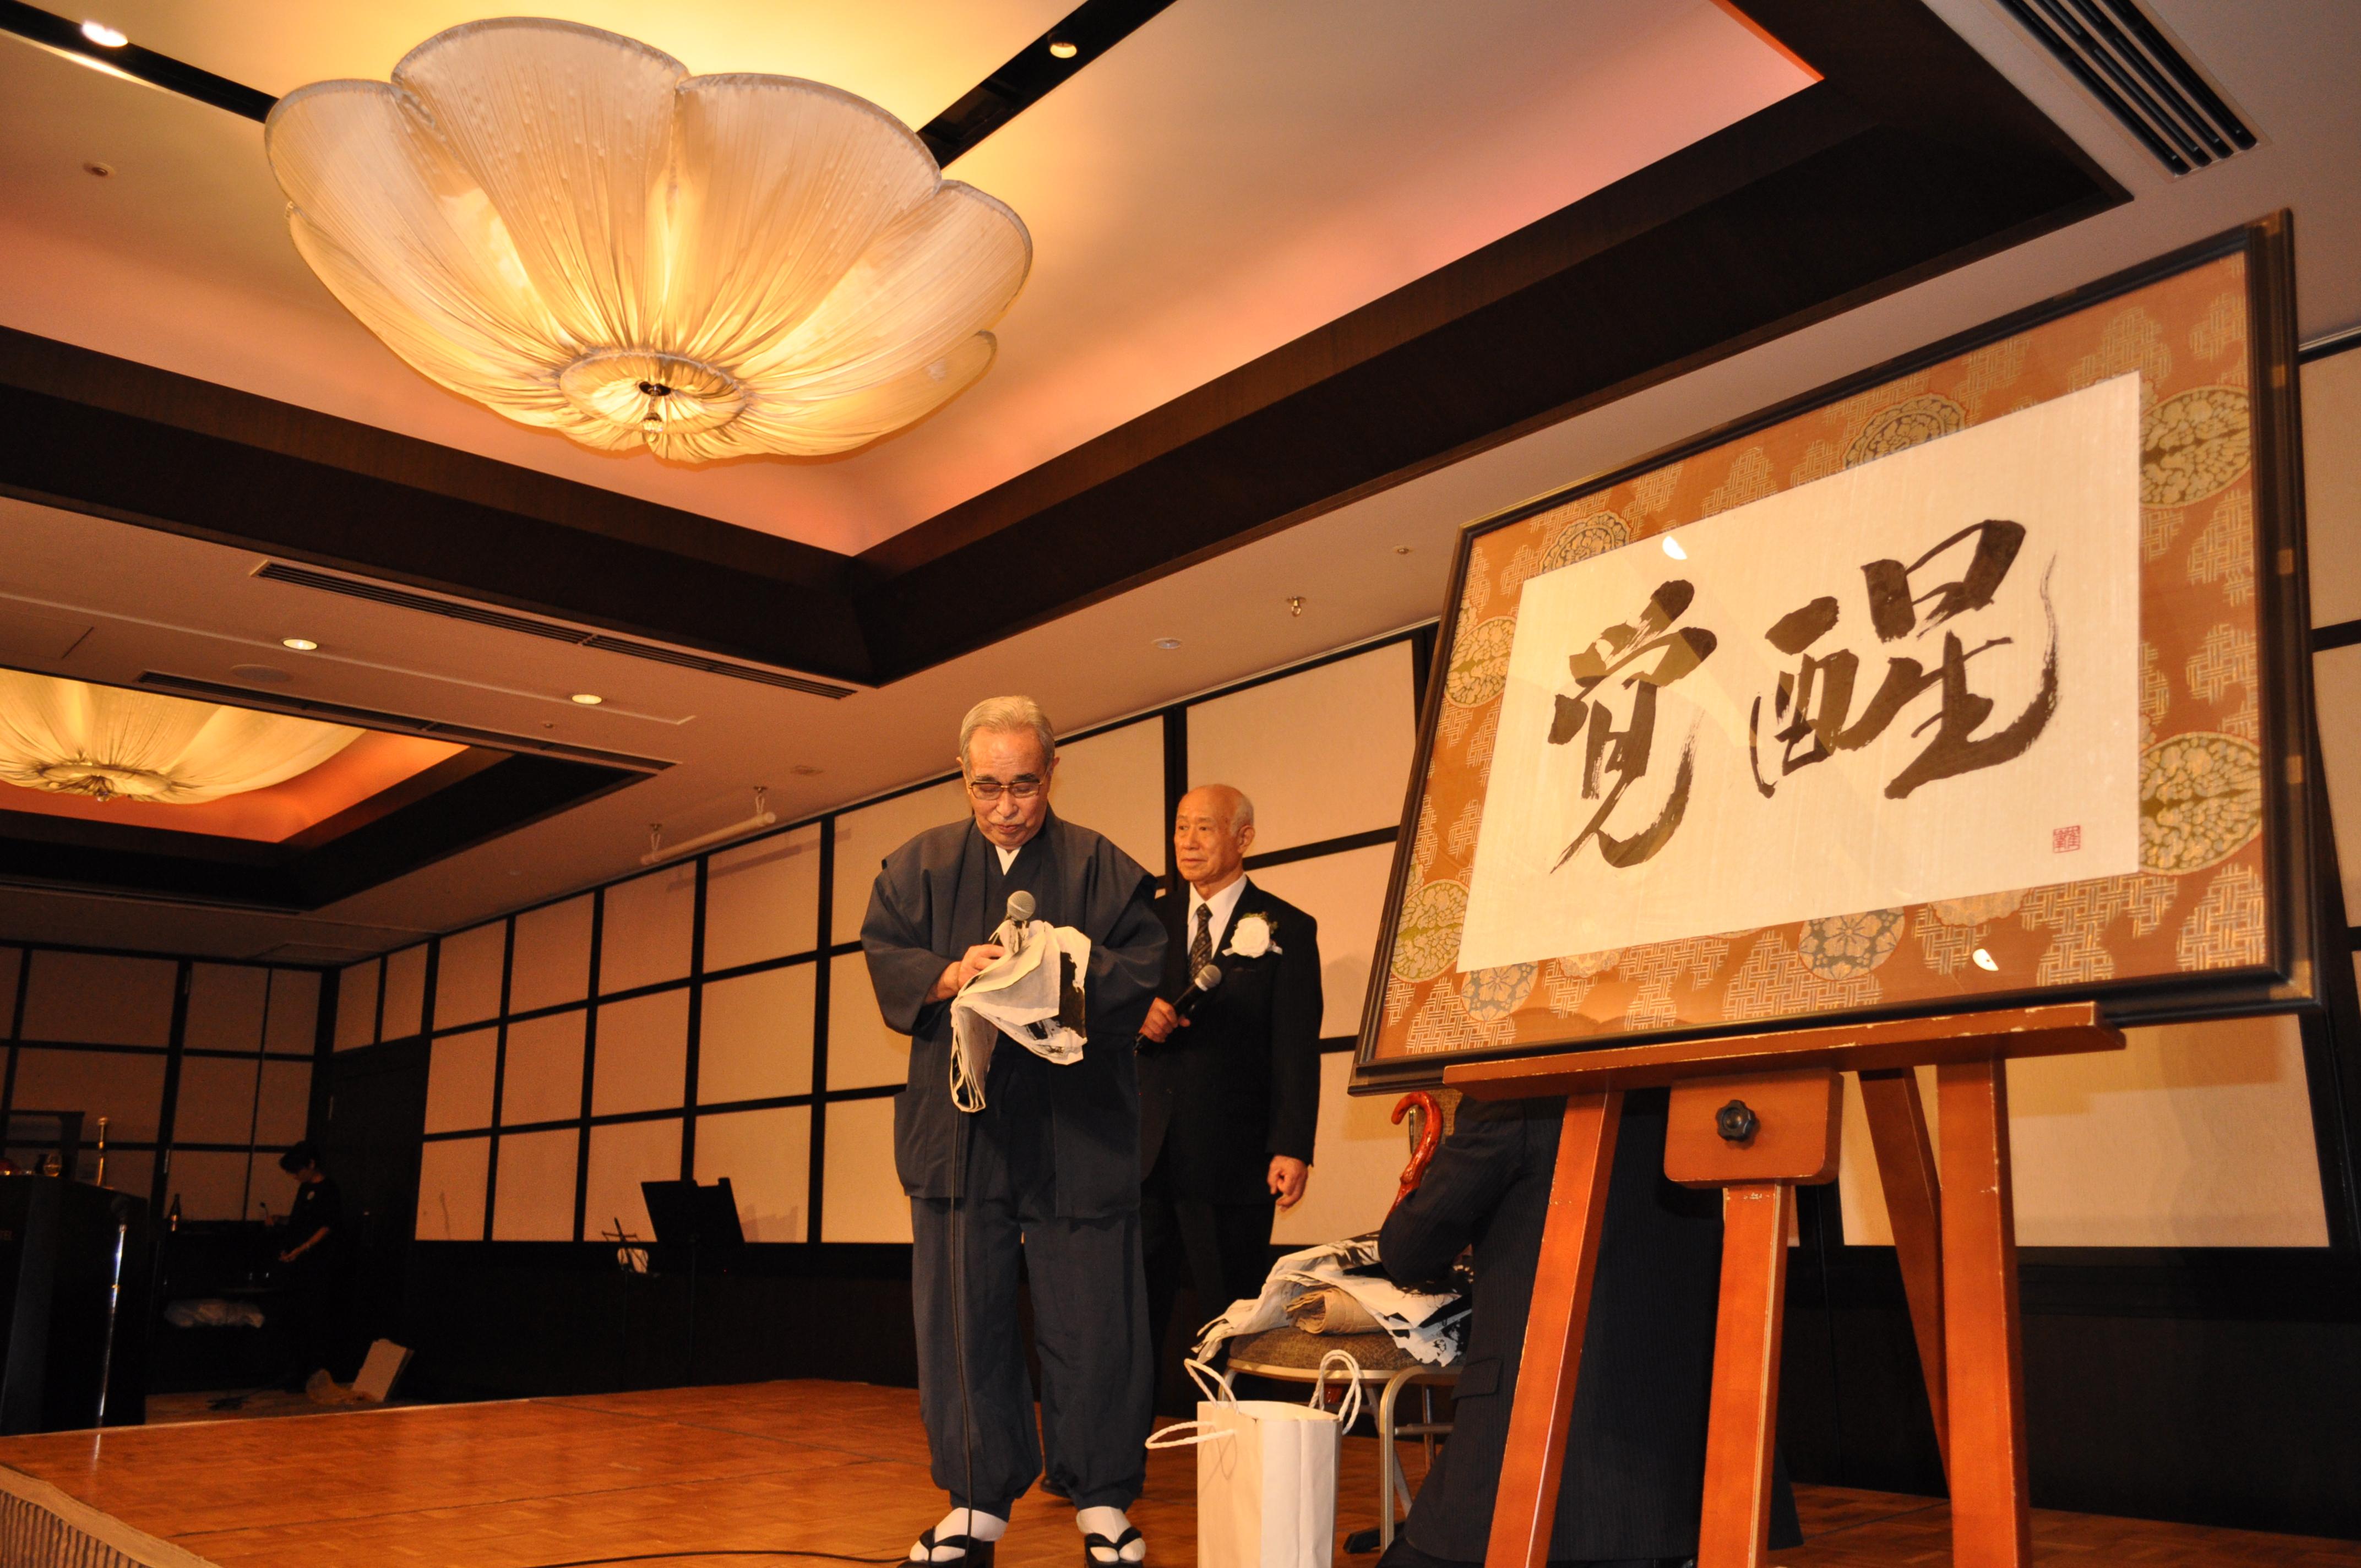 DSC 0539 - 第6回思風会全国大会2018in東京開催